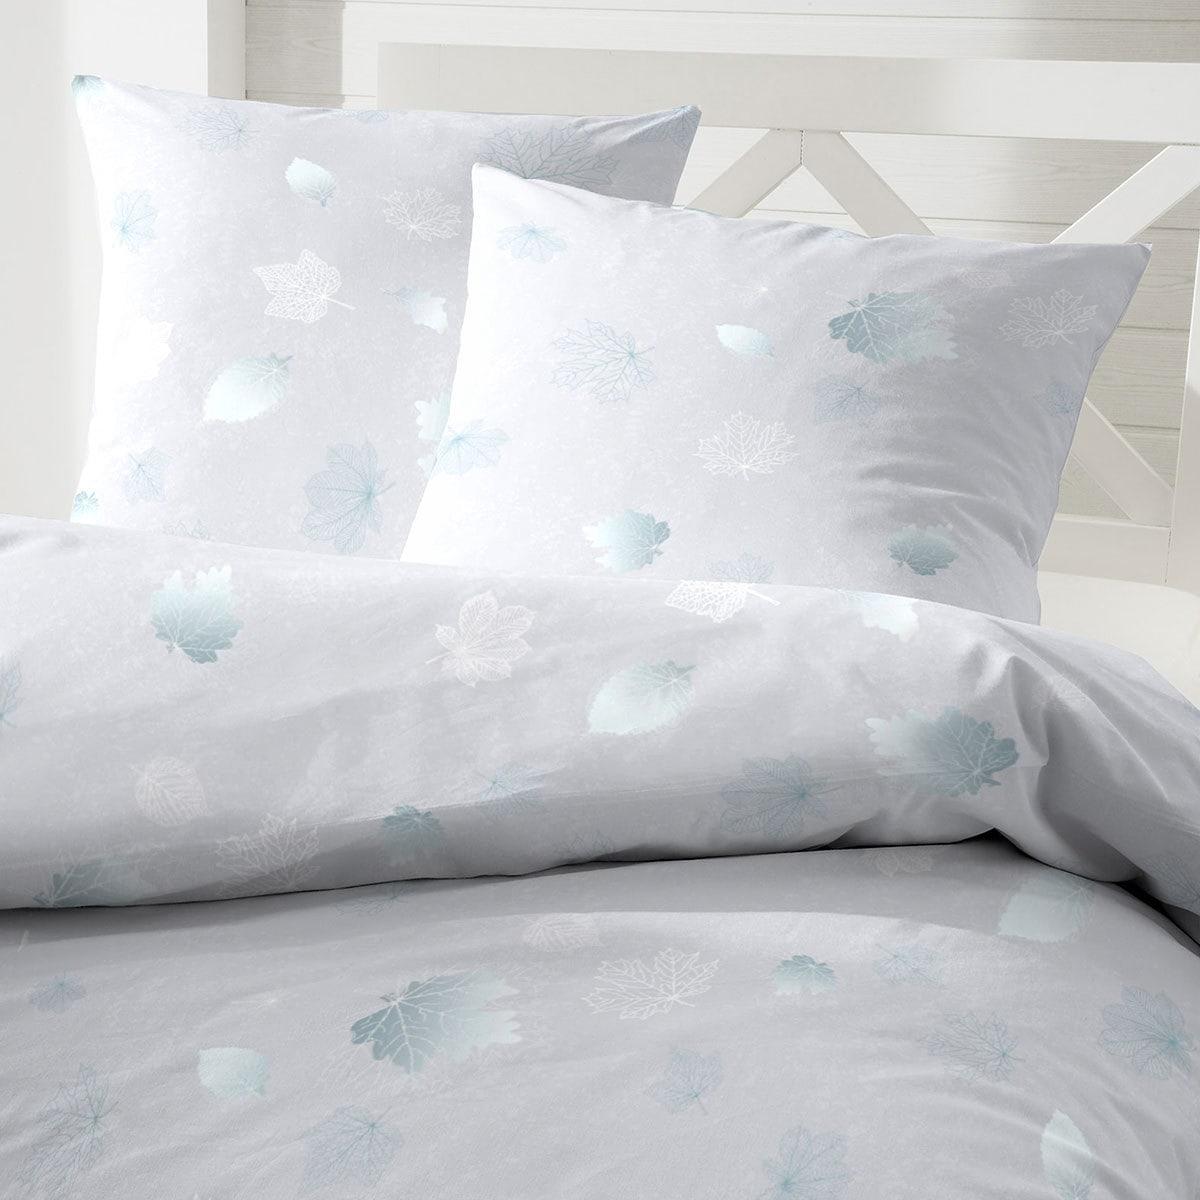 enrico coss soft jersey bettw sche paris gr n g nstig online kaufen bei bettwaren shop. Black Bedroom Furniture Sets. Home Design Ideas